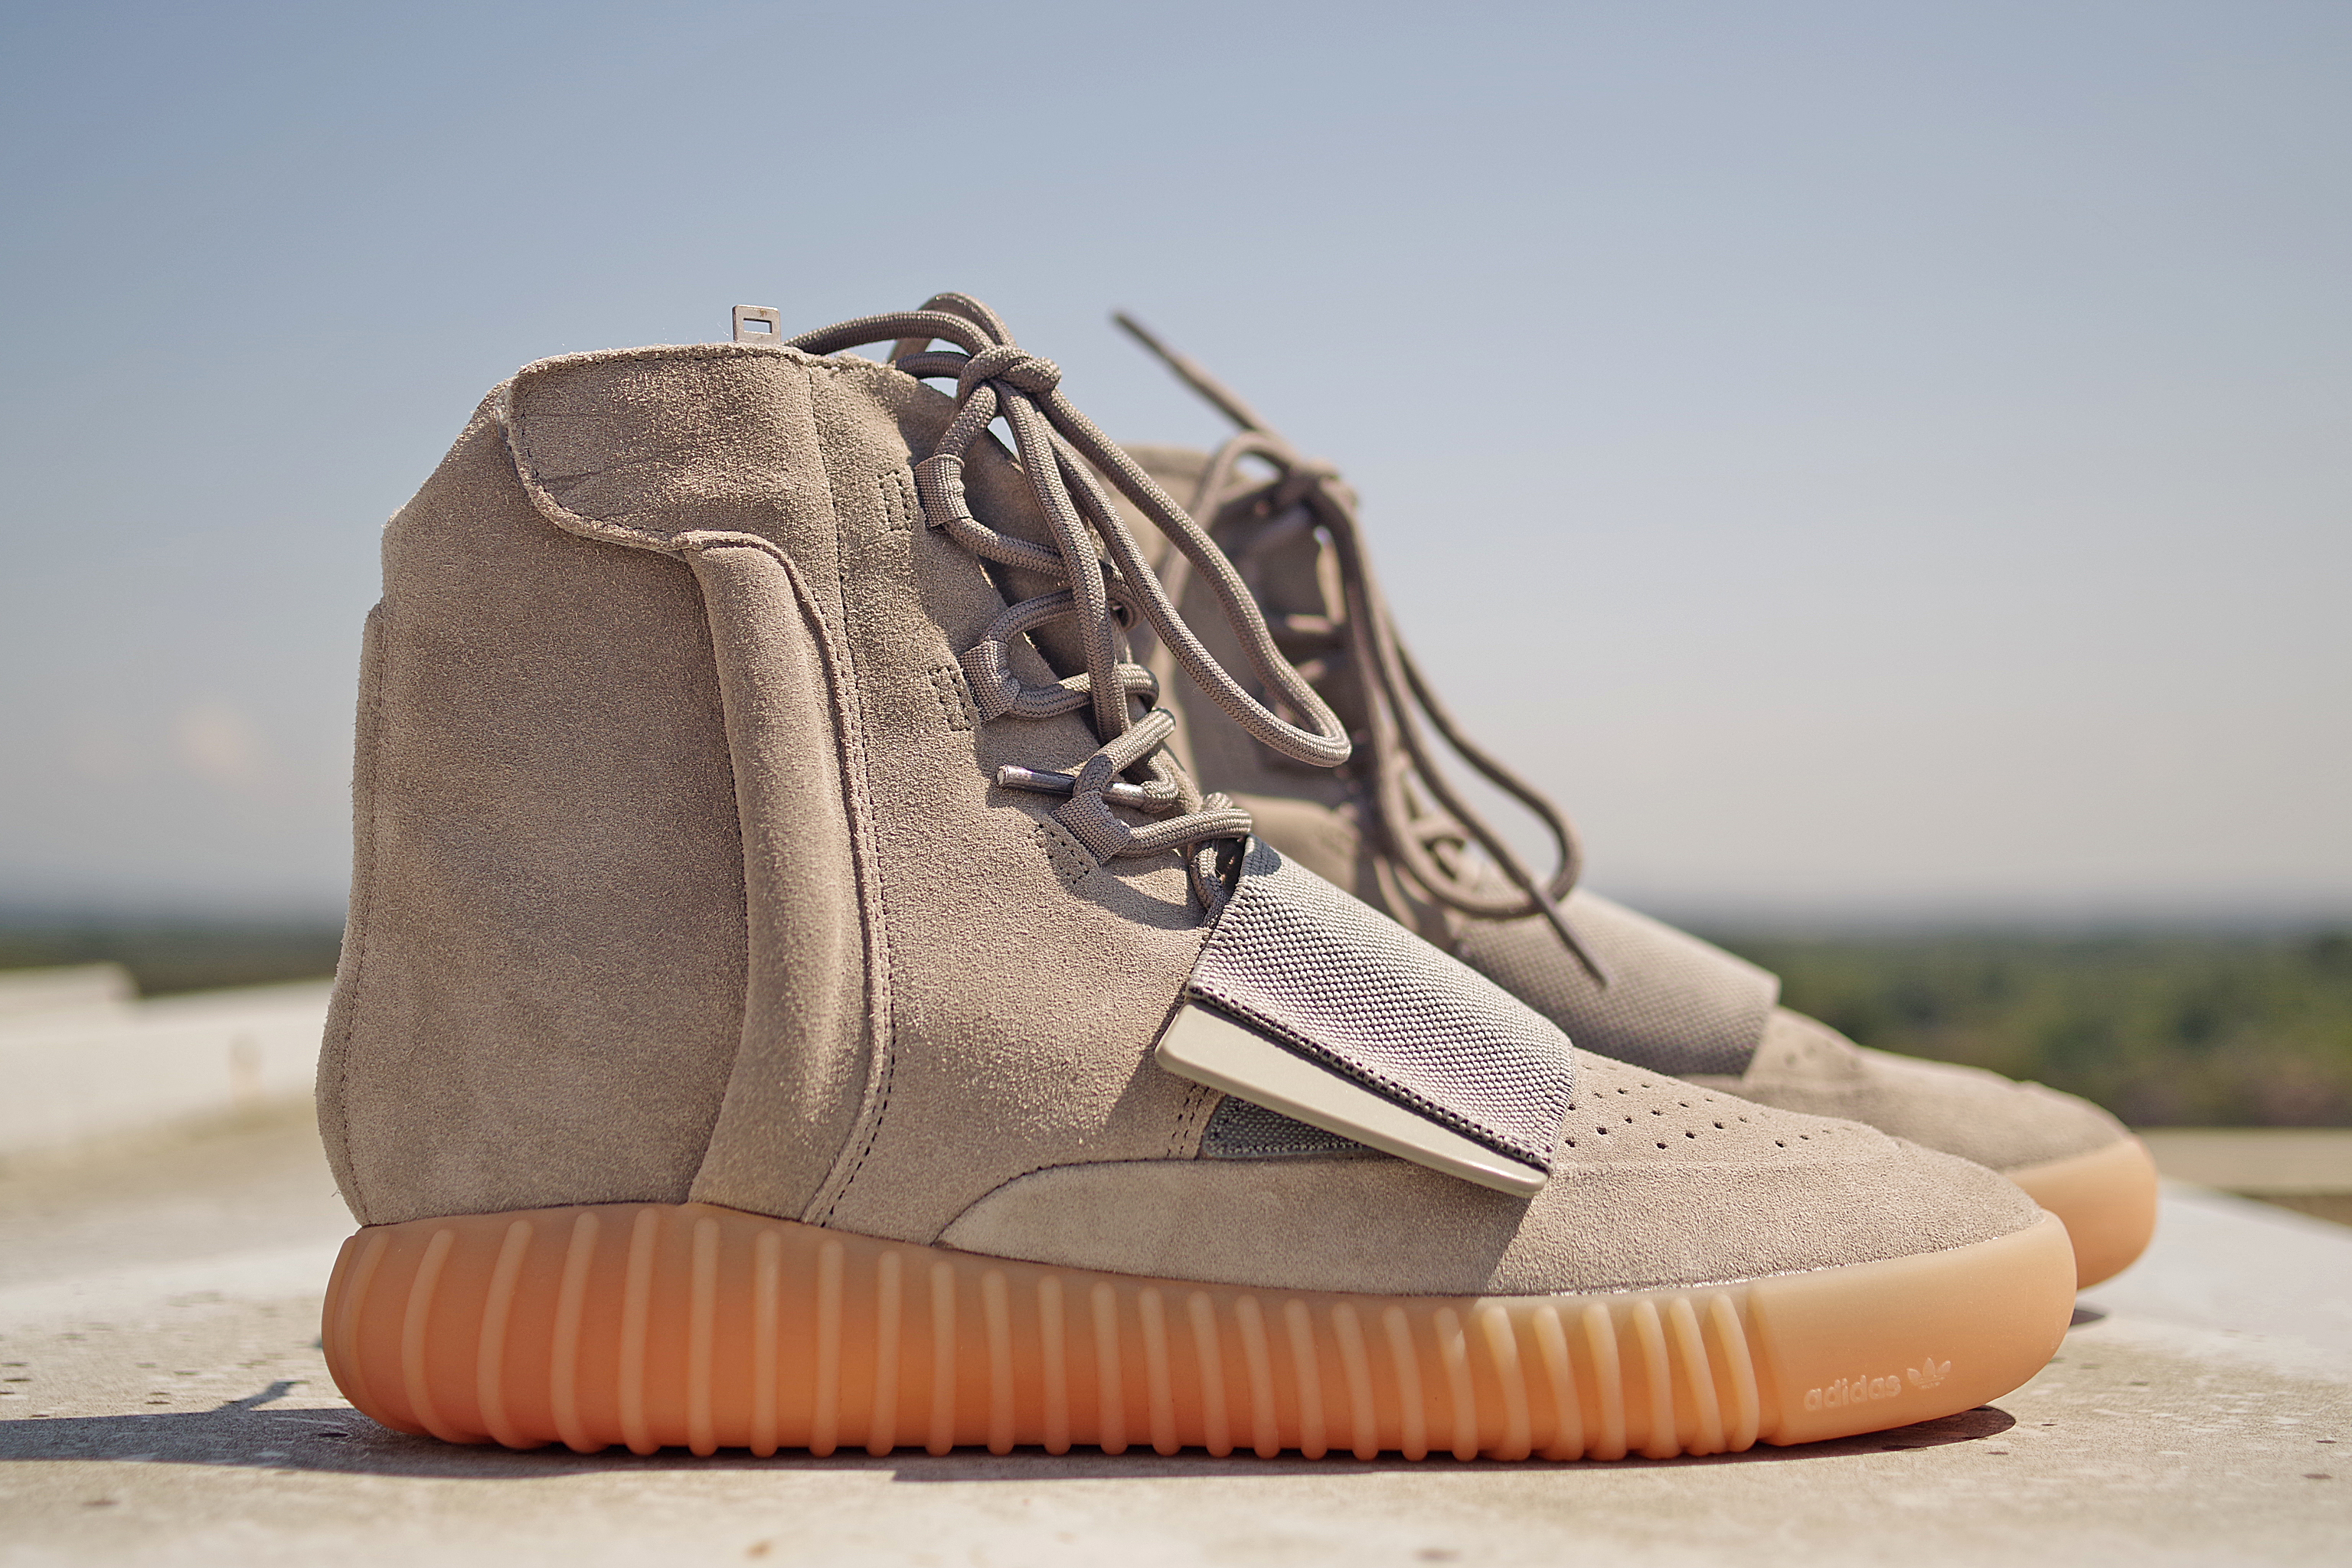 adidas yeezy boost 750 side